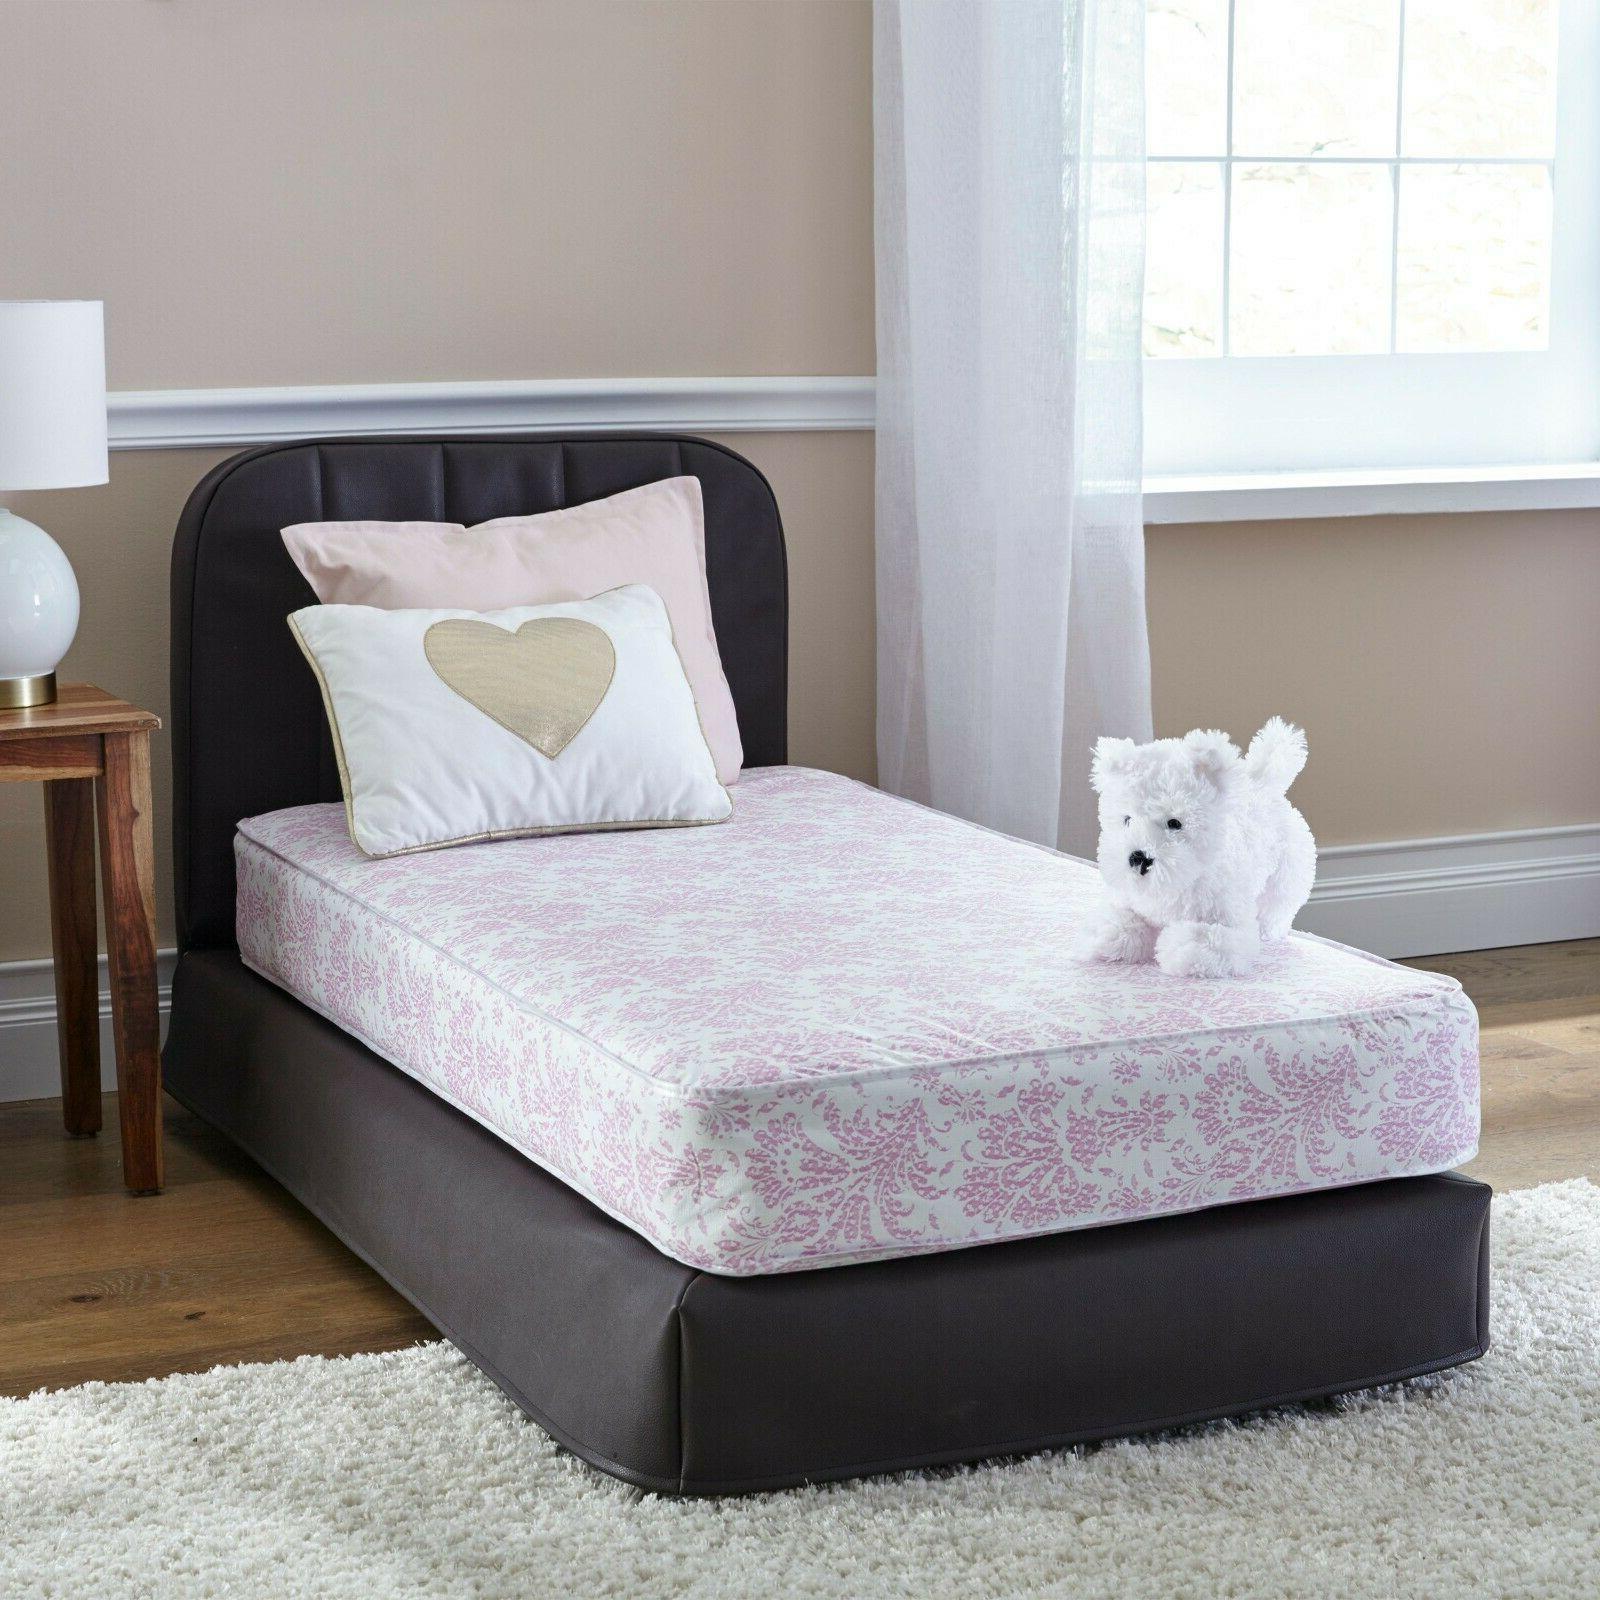 mattress seally ortho rest crib mattresses